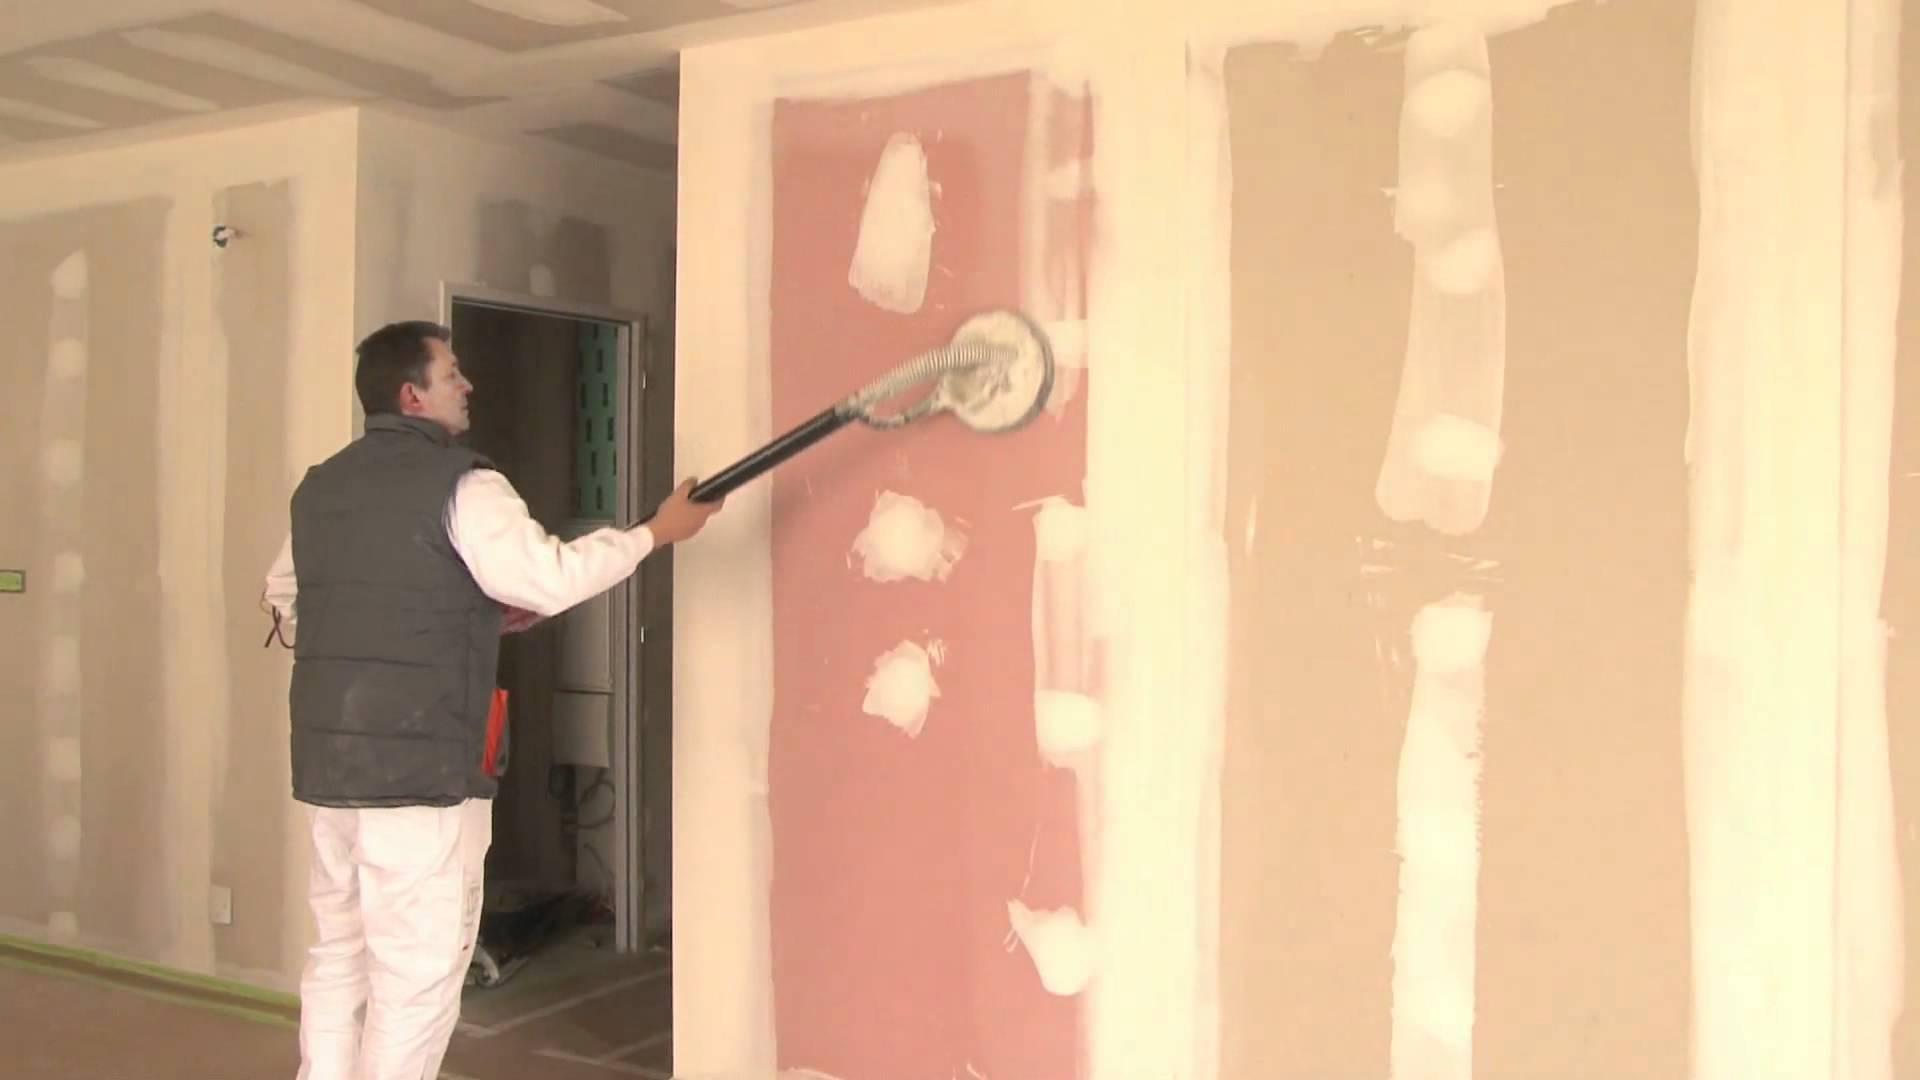 Peindre sa maison rennes blog immobilier et jardin for Maison a peindre